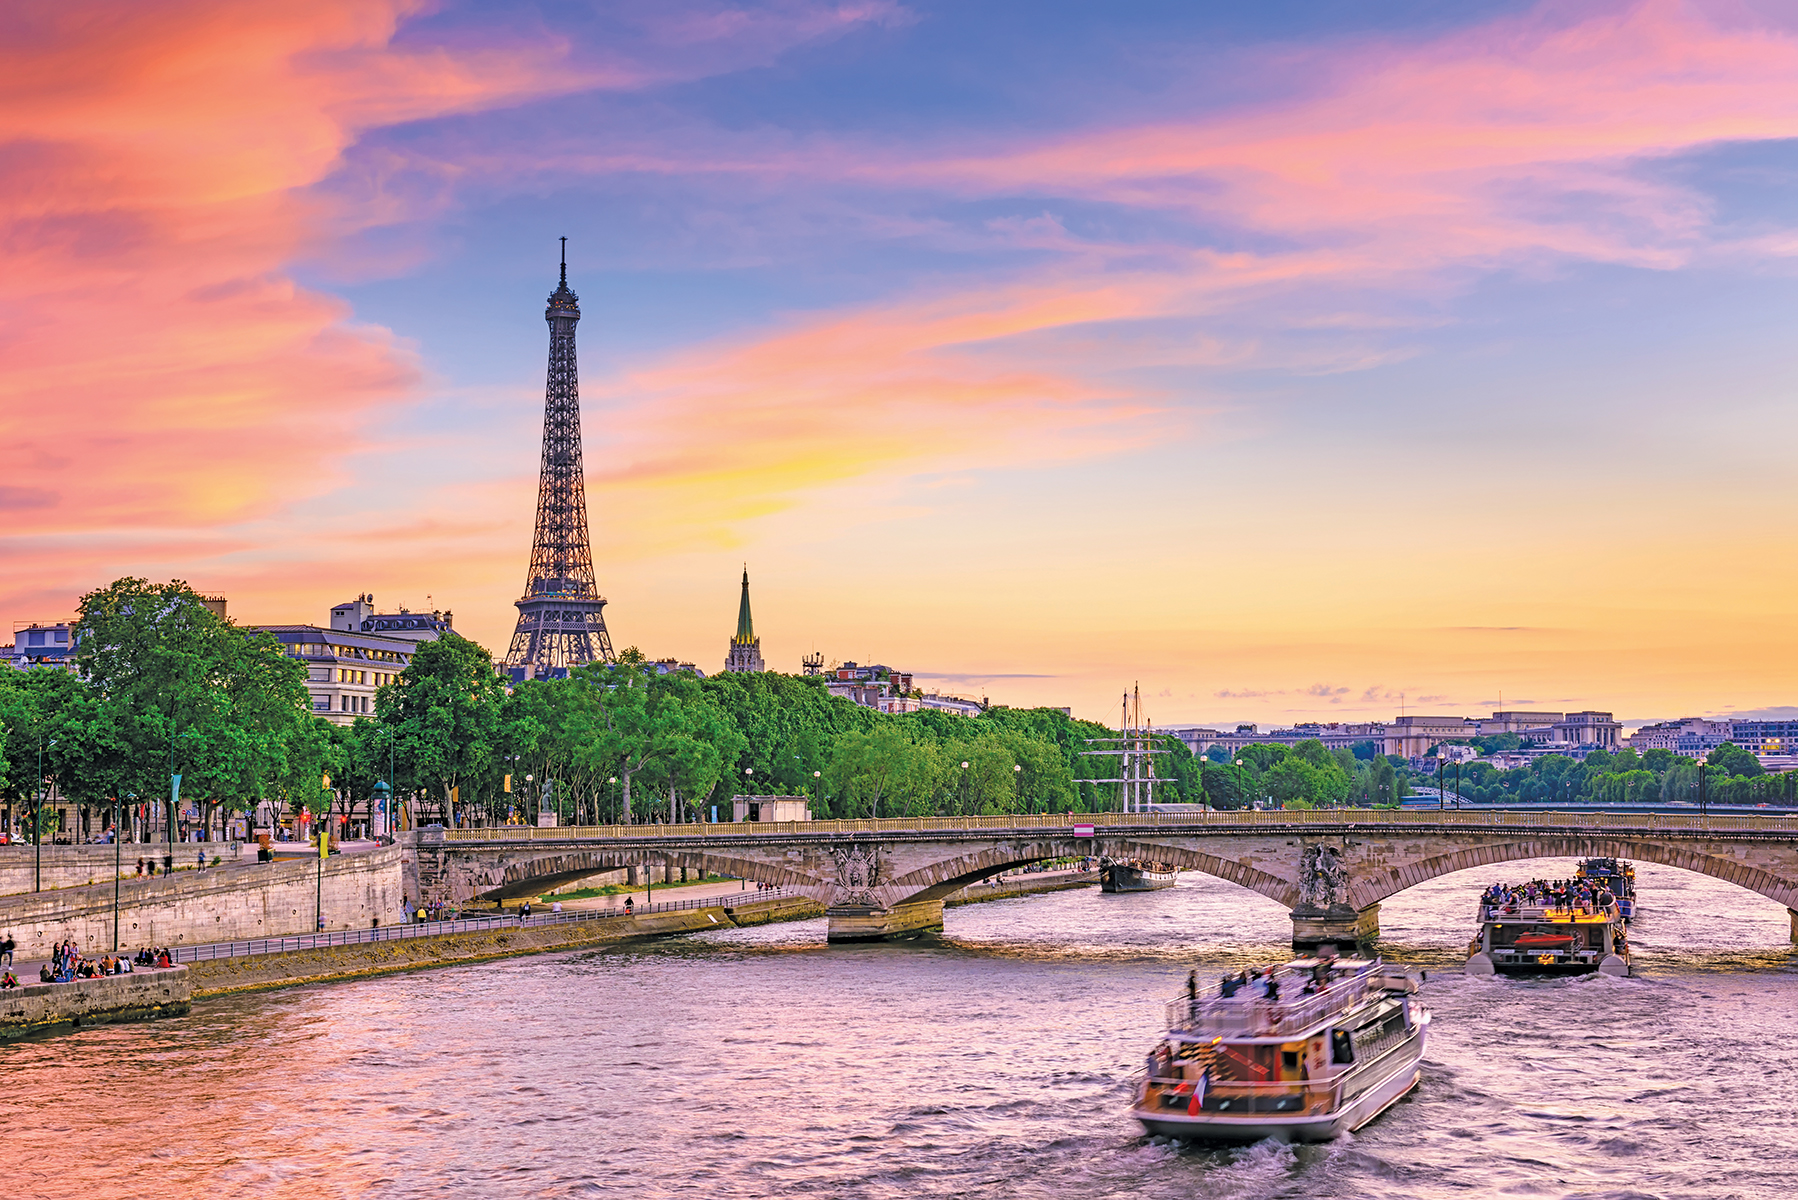 Sun Sets behind the Eiffel Tower. Bridge that overpasses the Seine River.